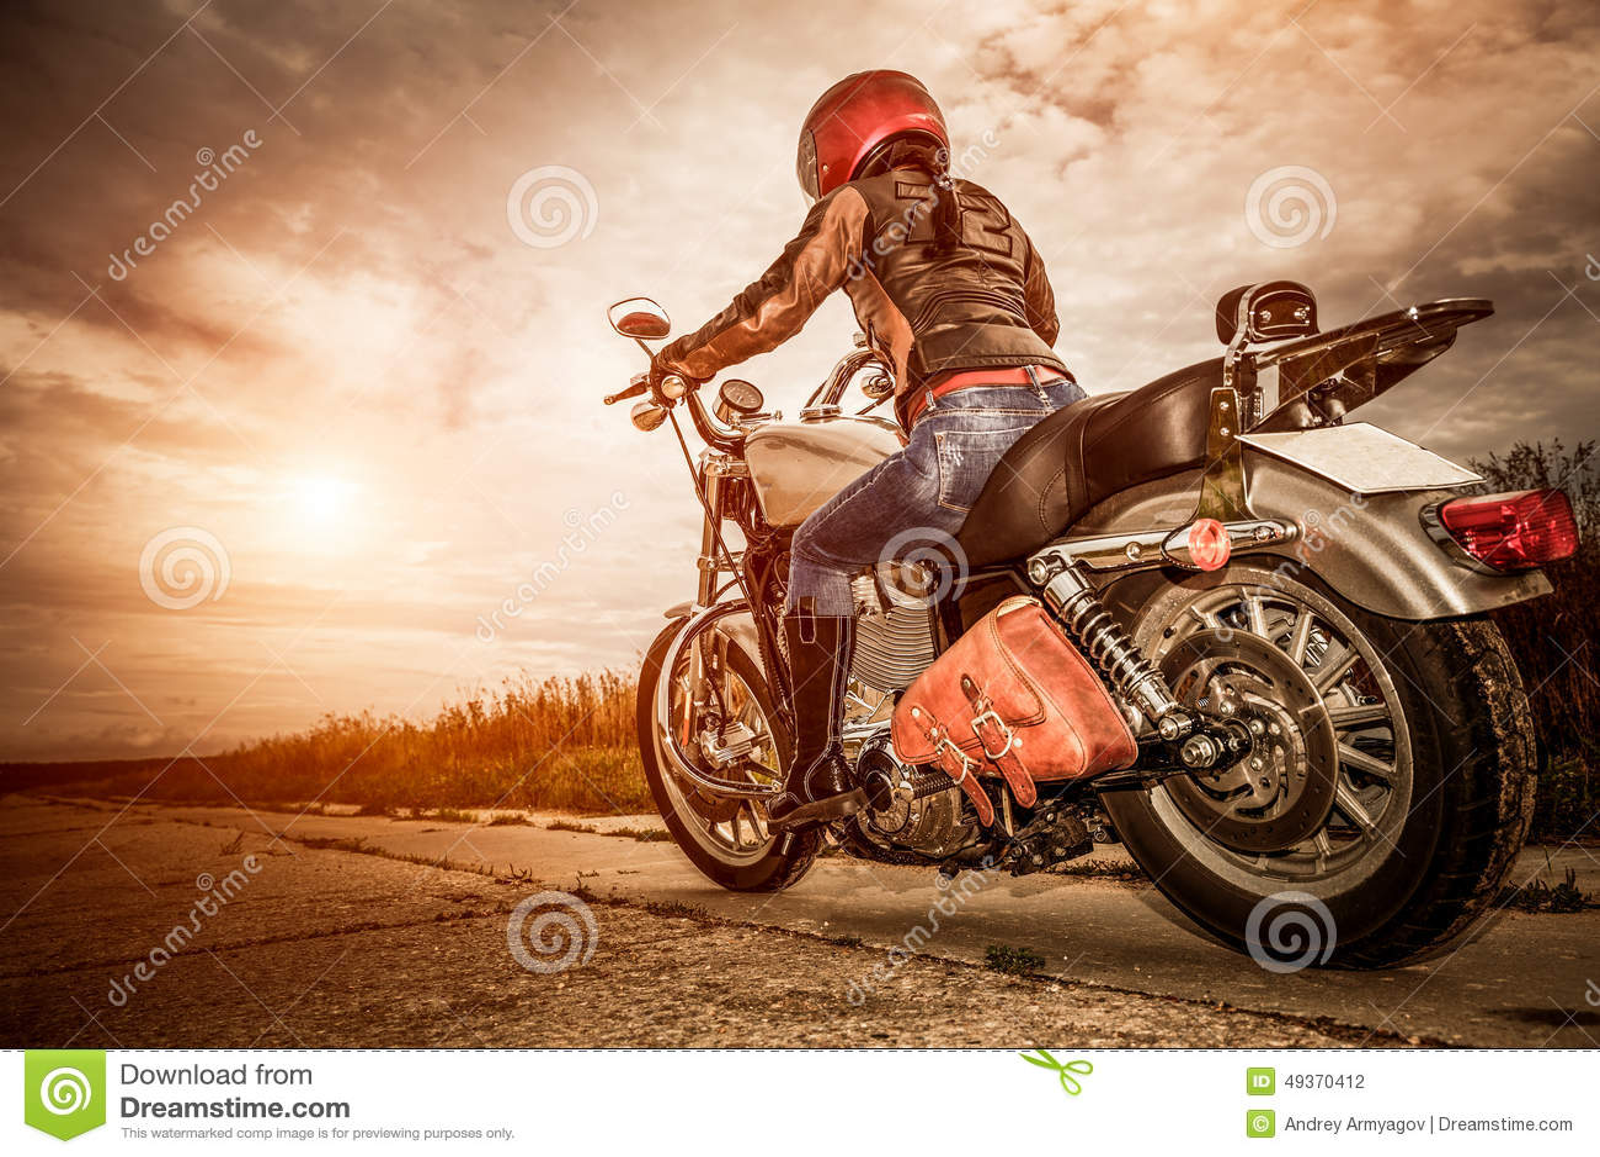 Power Pop Girl Wallpaper Biker Girl On A Motorcycle Stock Photo Image Of Freedom